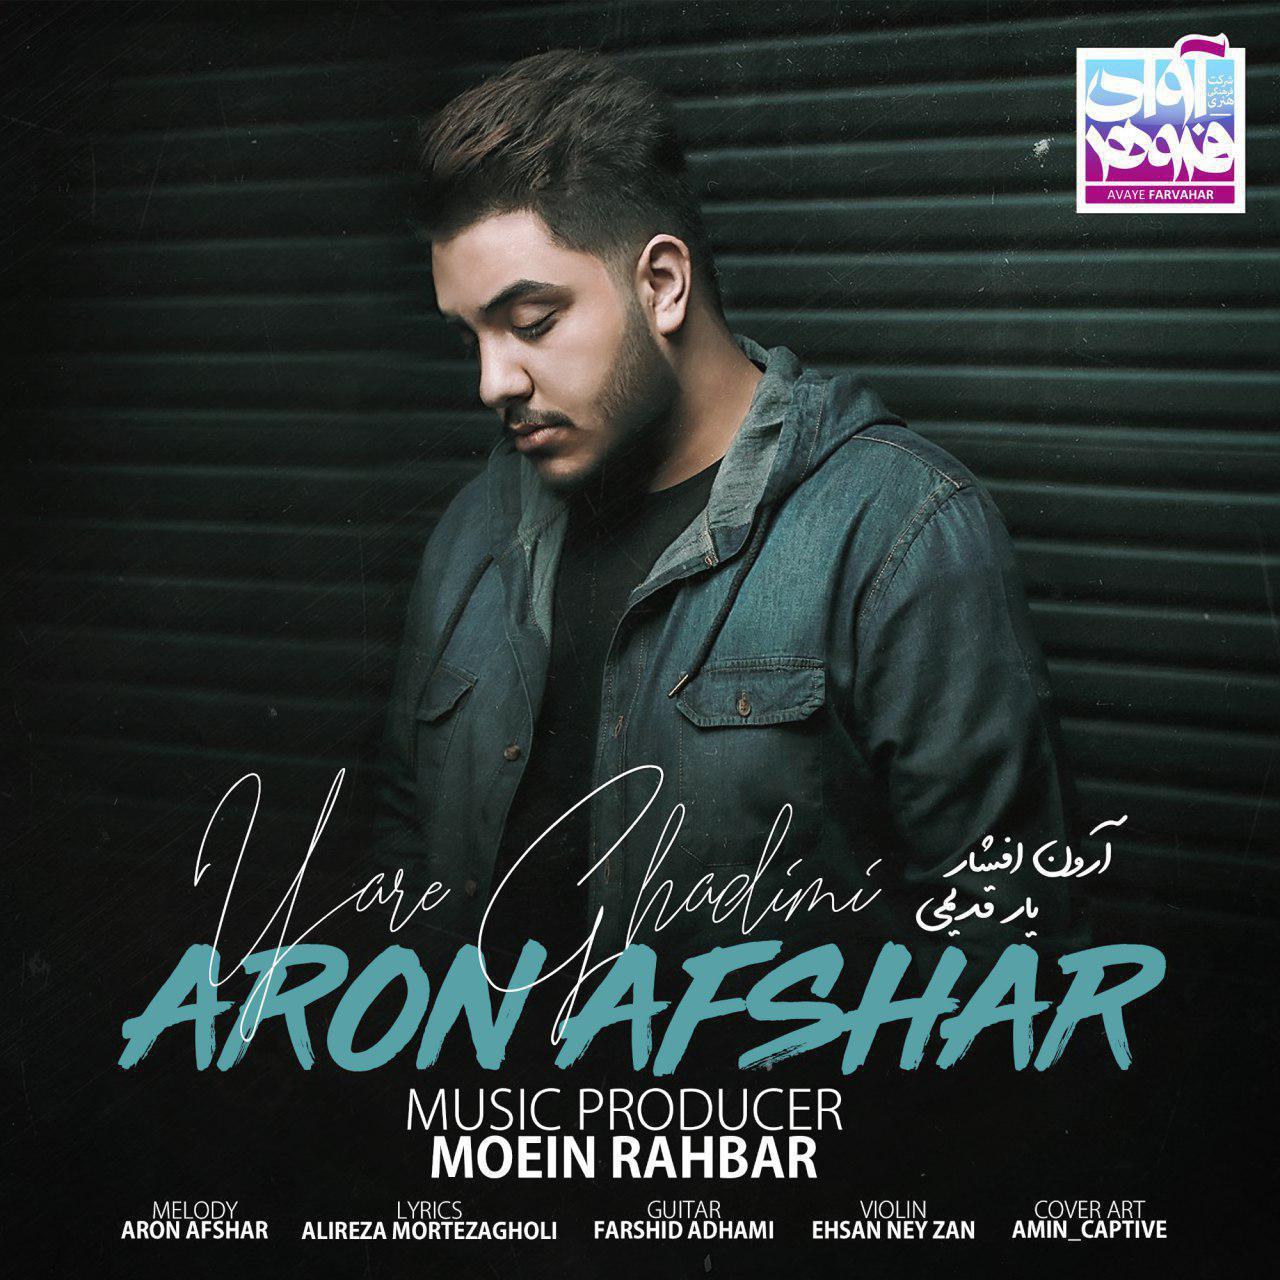 Aron Afshar – Yare Ghadimi